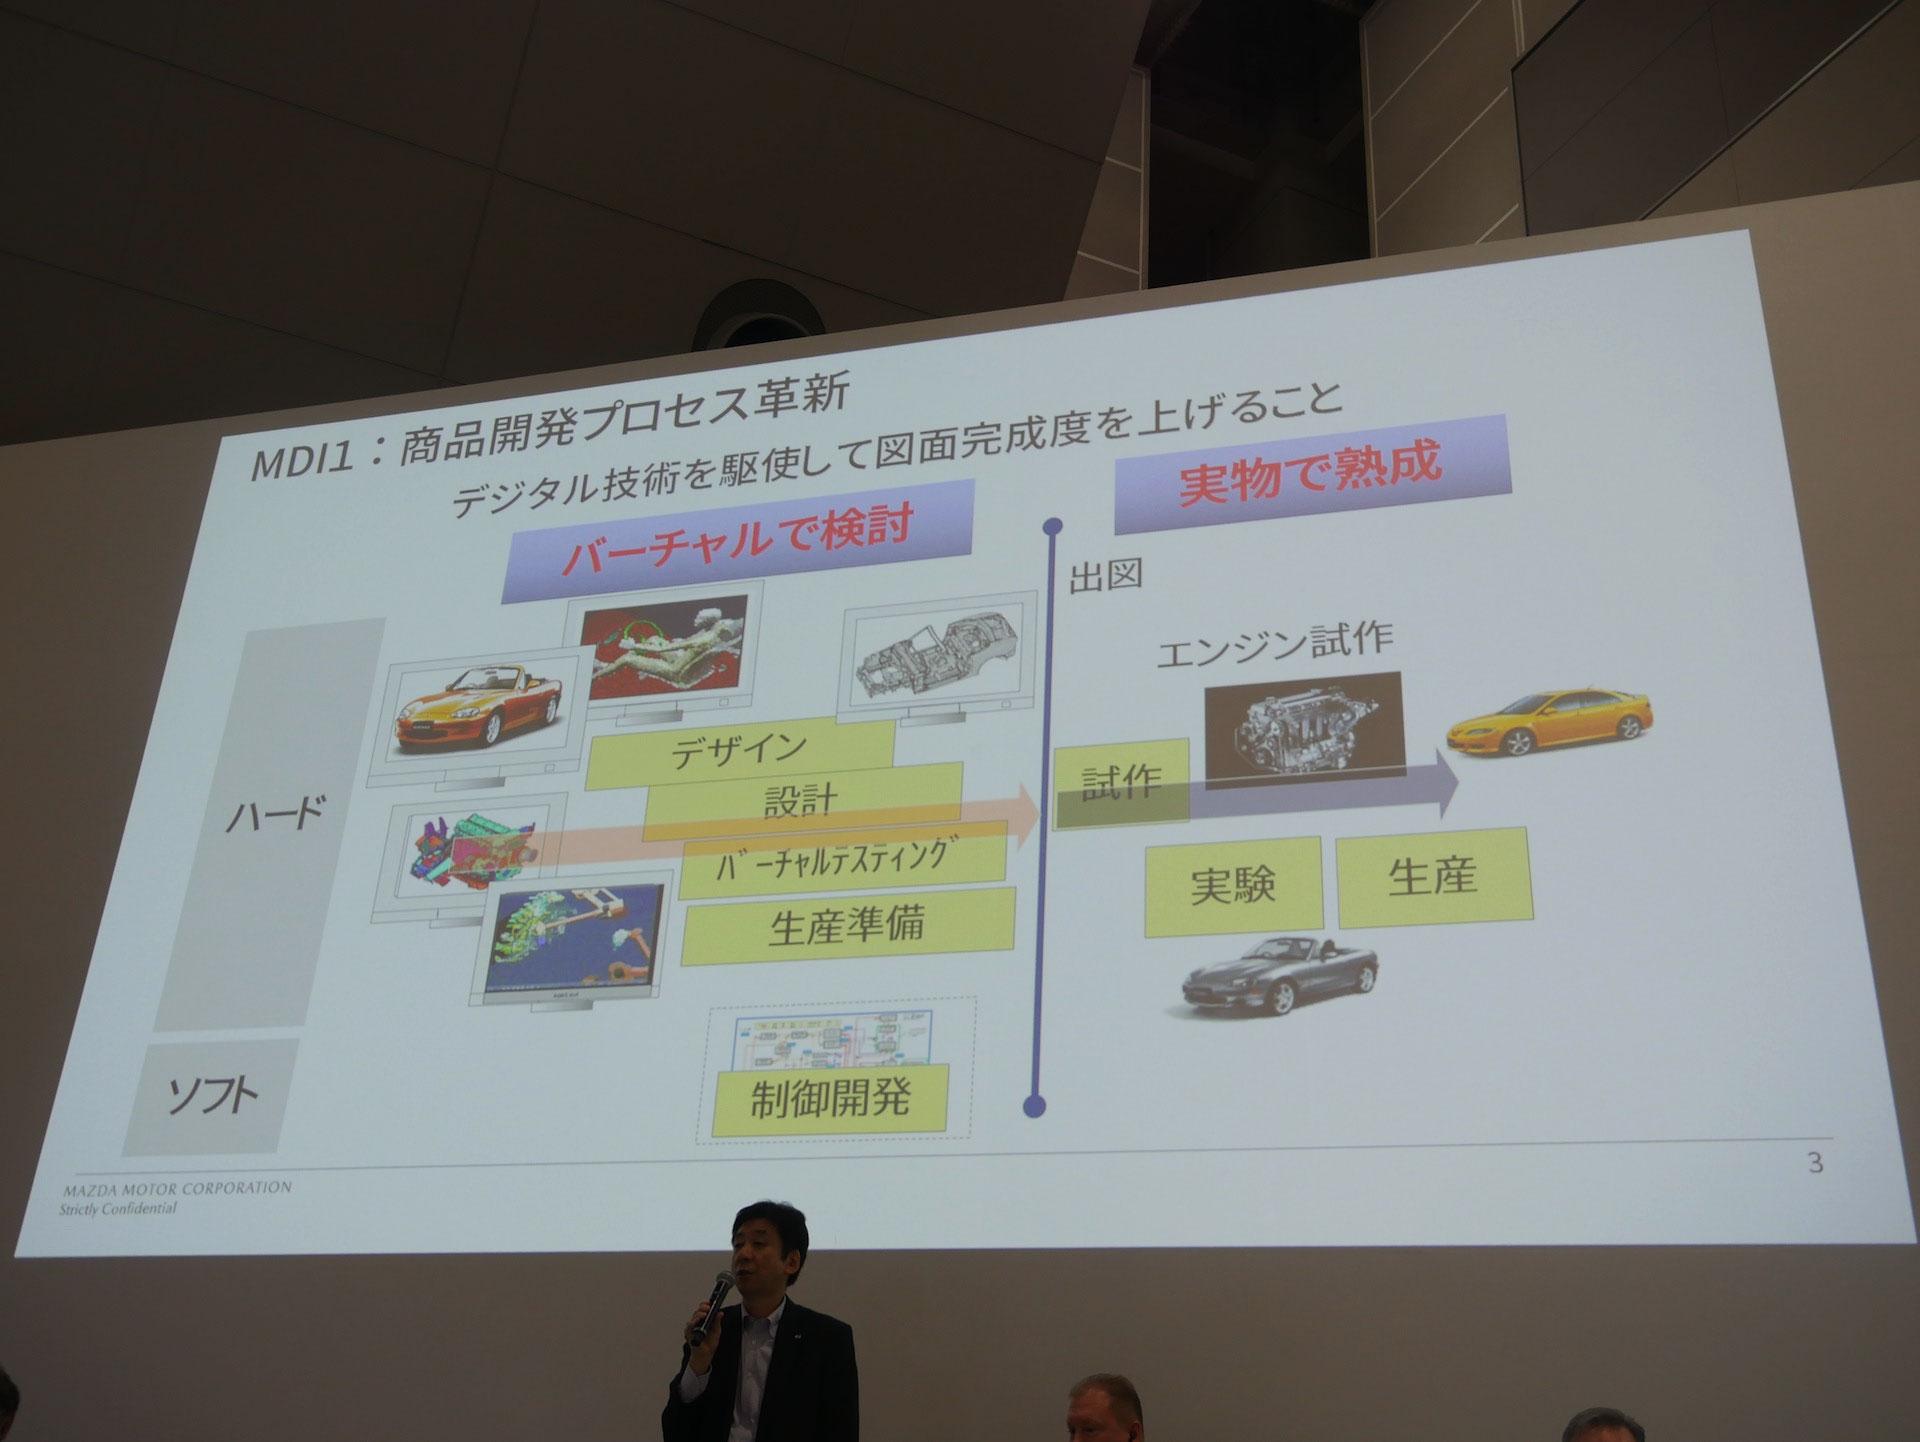 MDI1は商品開発プロセスの革新 バーチャルで検討し実物で熟成する体制を築いた(撮影:安蔵靖志)